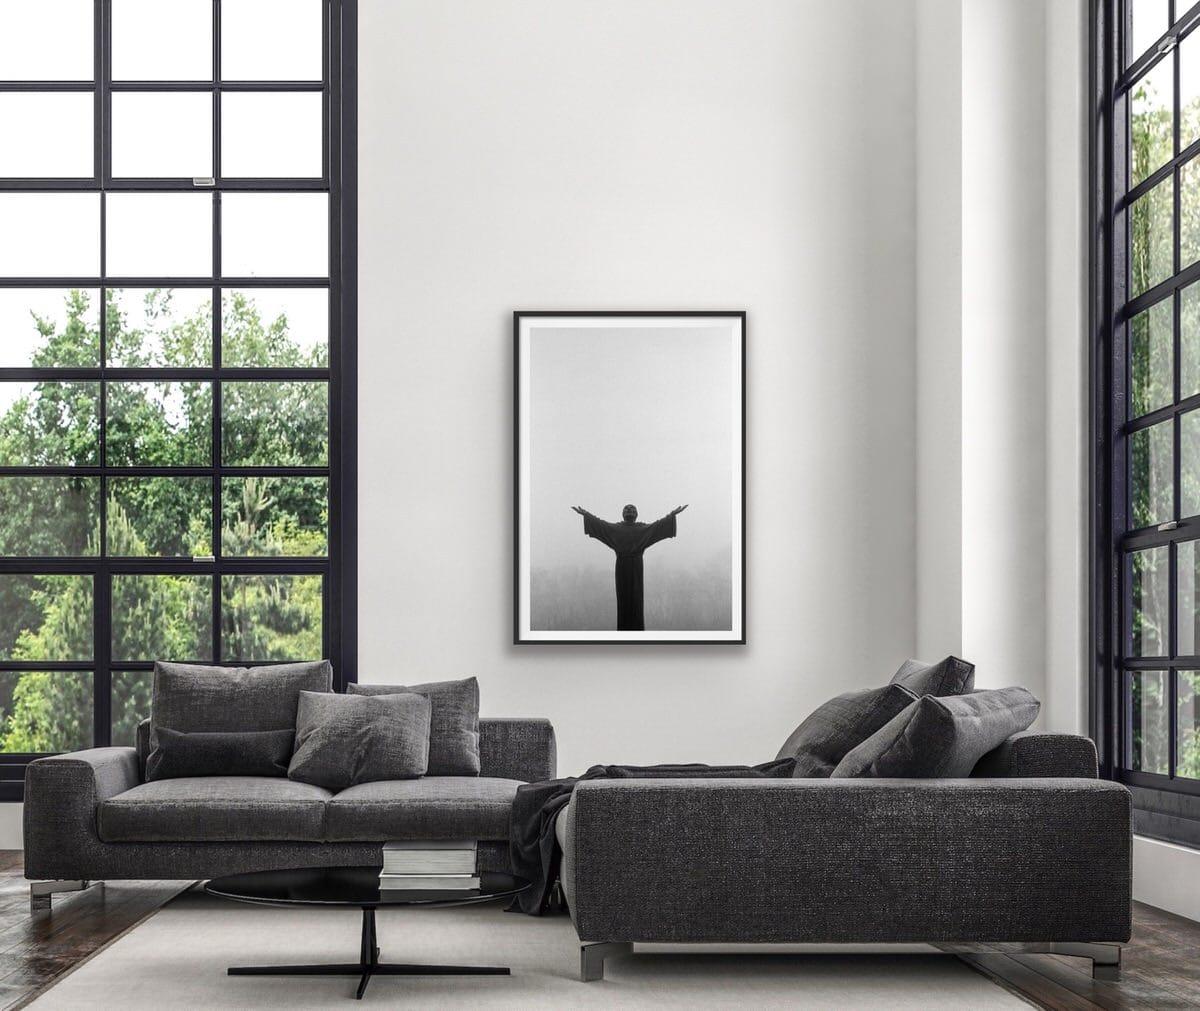 Black-and-white-fine-art-film-photography-wall-decor-by-emerging-artist-Studio-L-photographer-Laura-Schneider-_4705